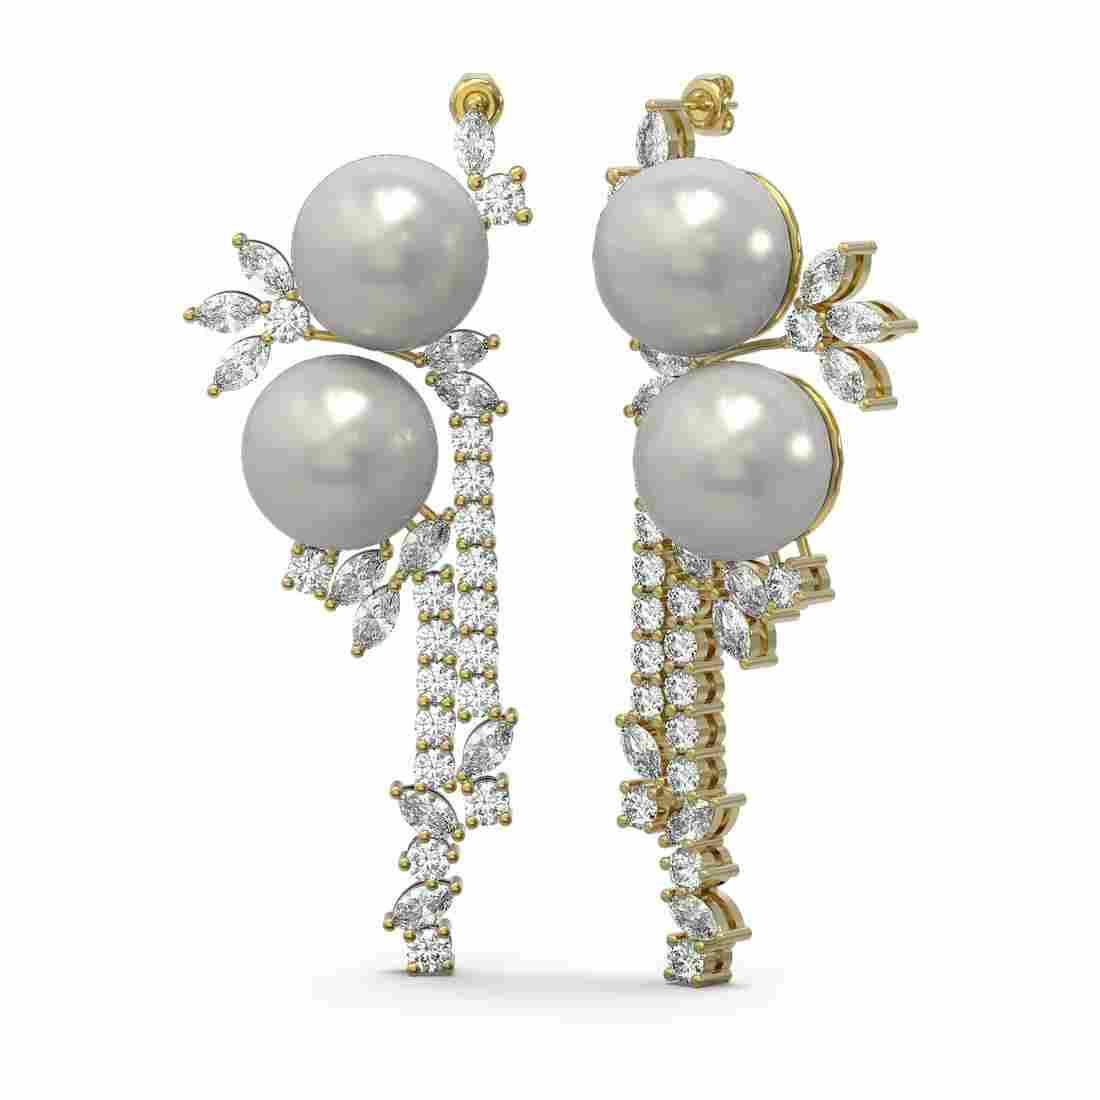 6.17 ctw Diamond & Pearl Earrings 18K Yellow Gold -